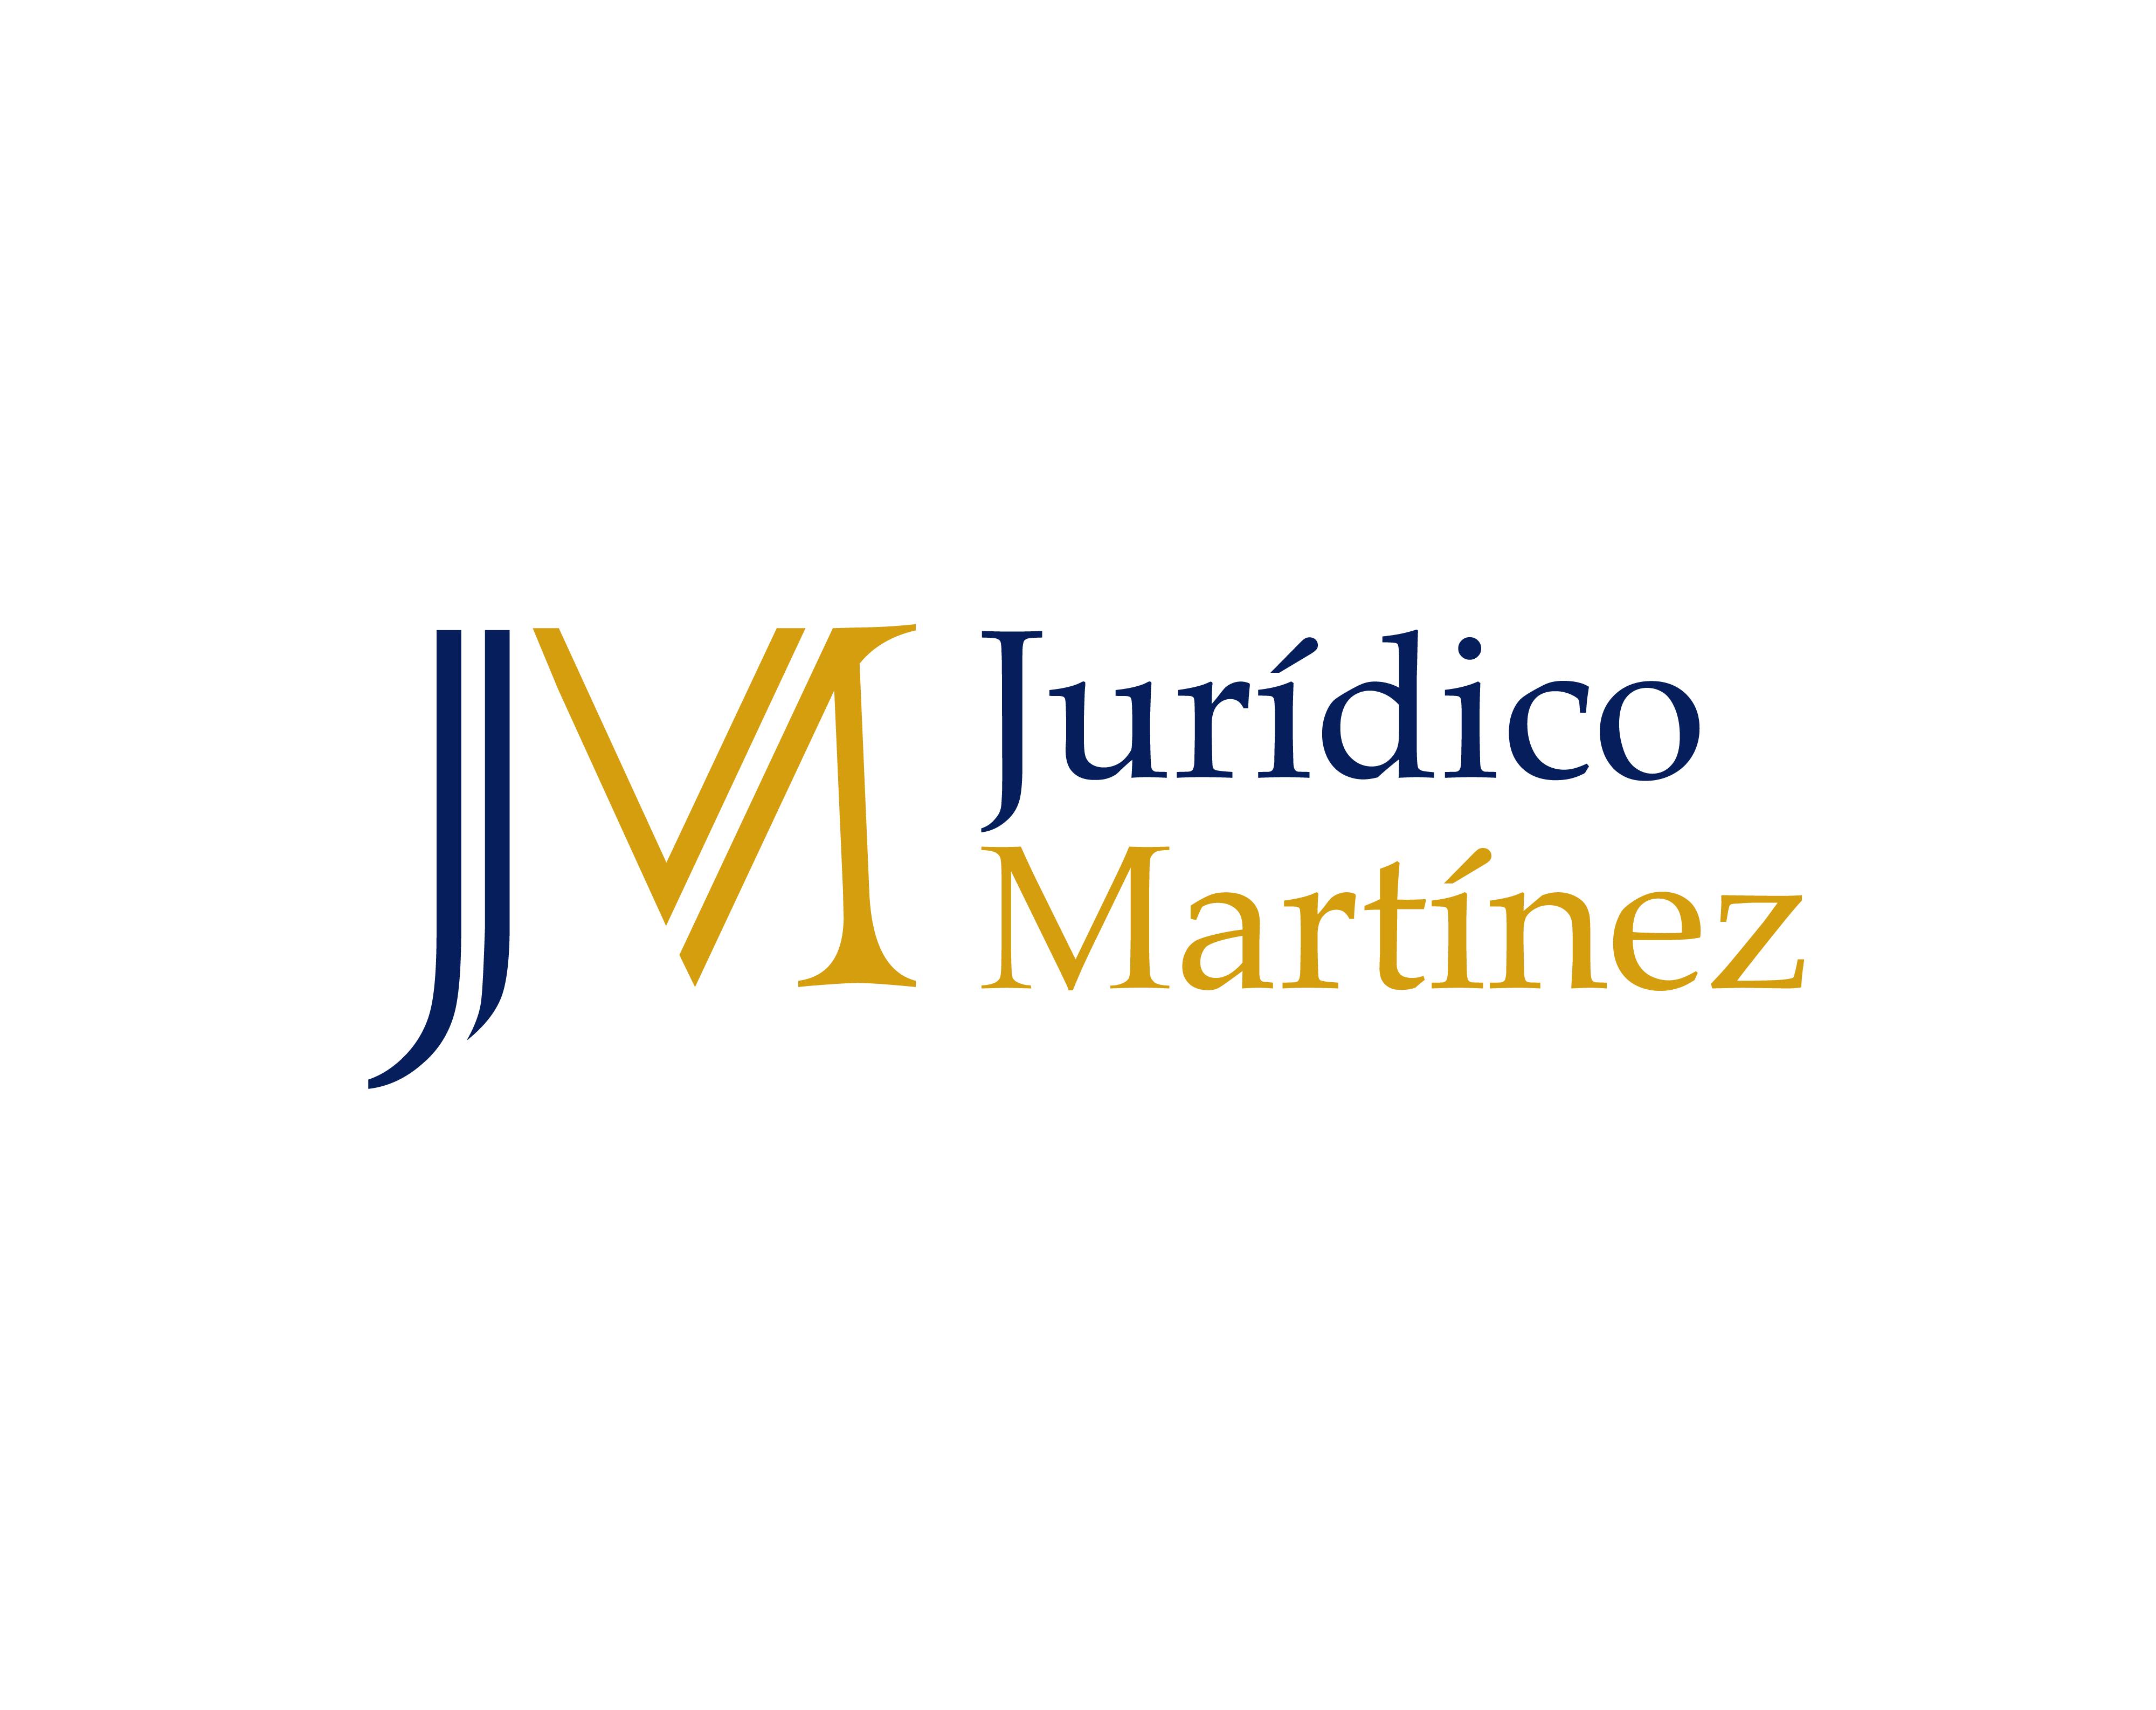 Jurídico Martínez